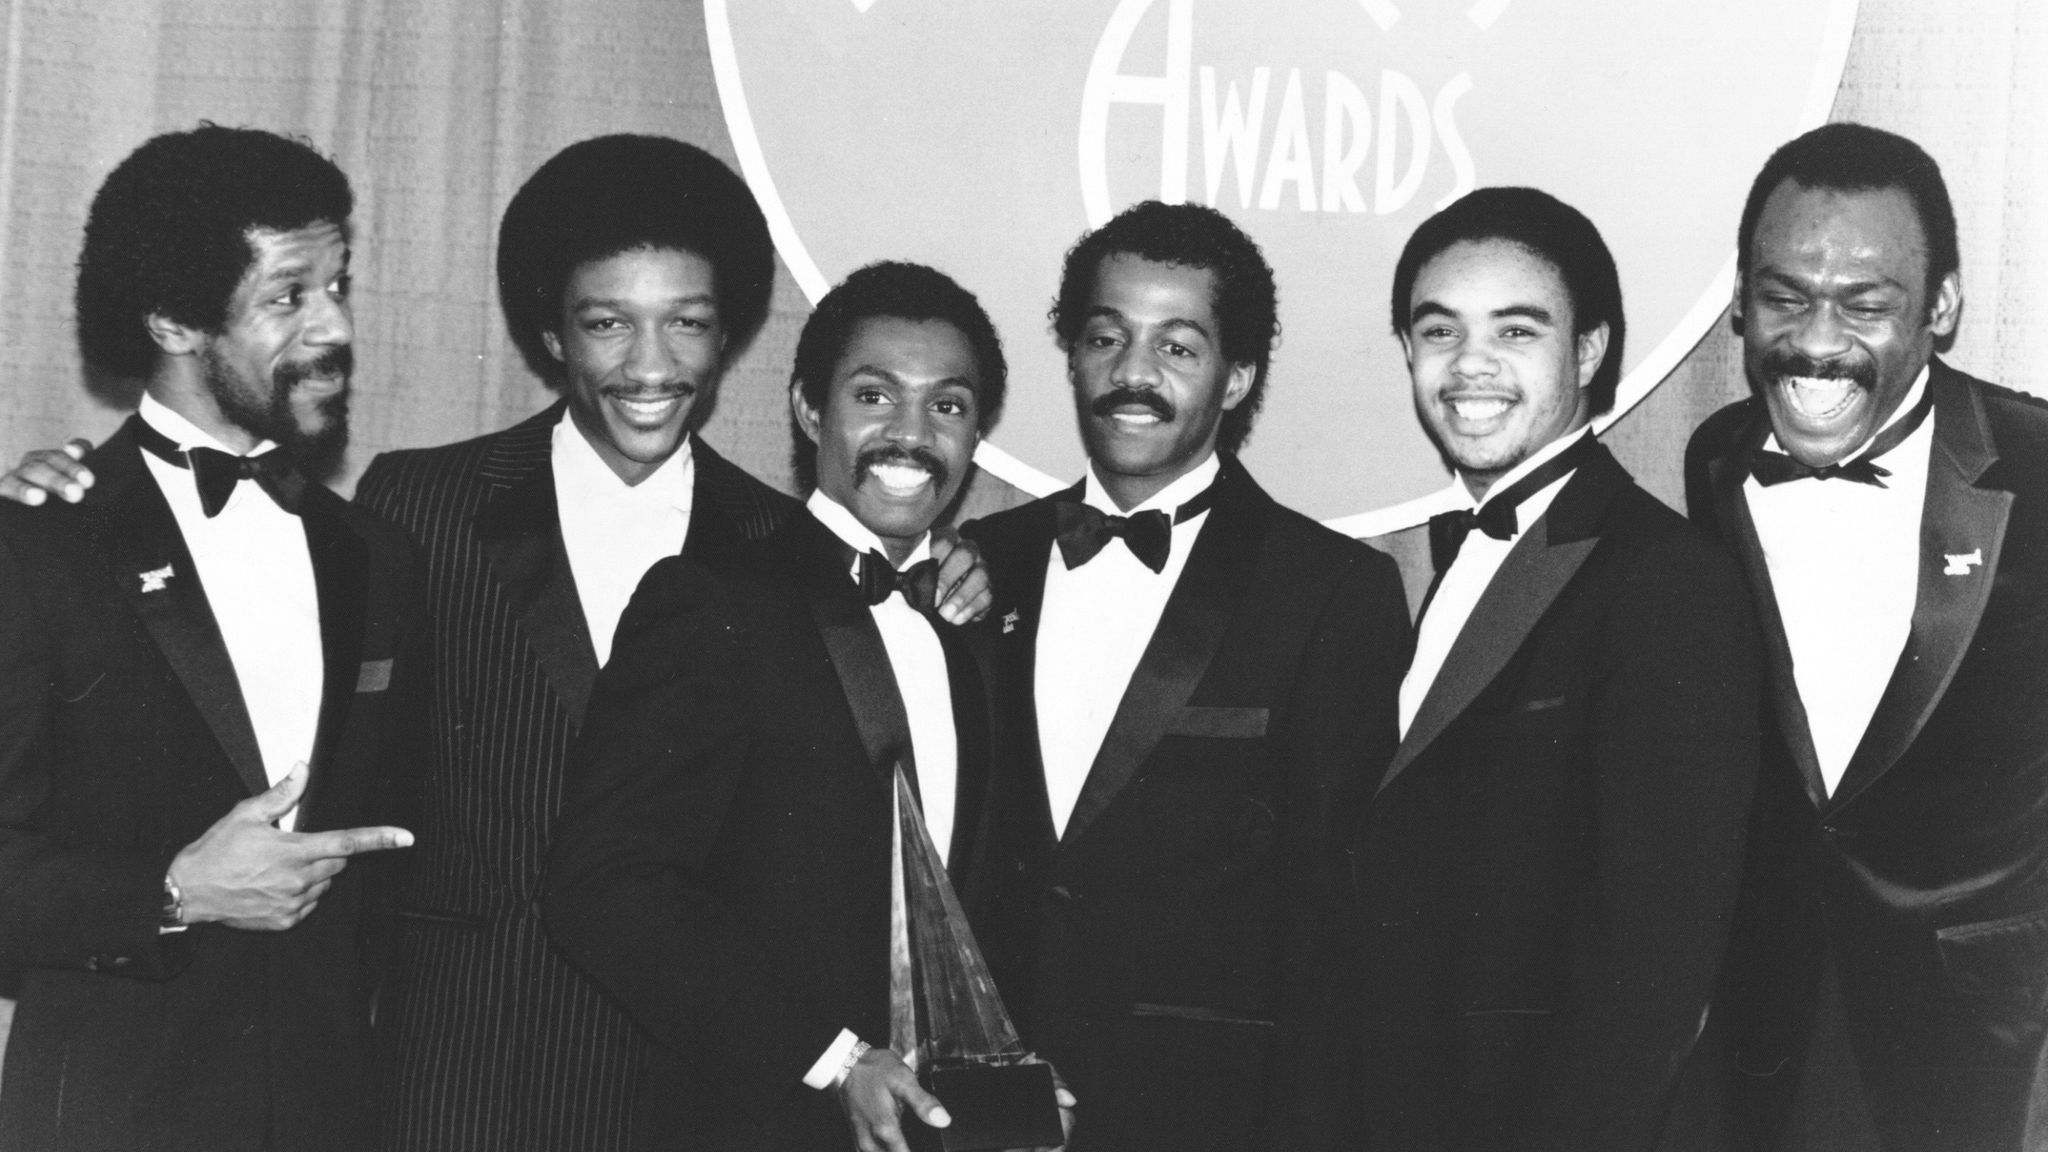 Kool & The Gang at the 1982 American Music Awards